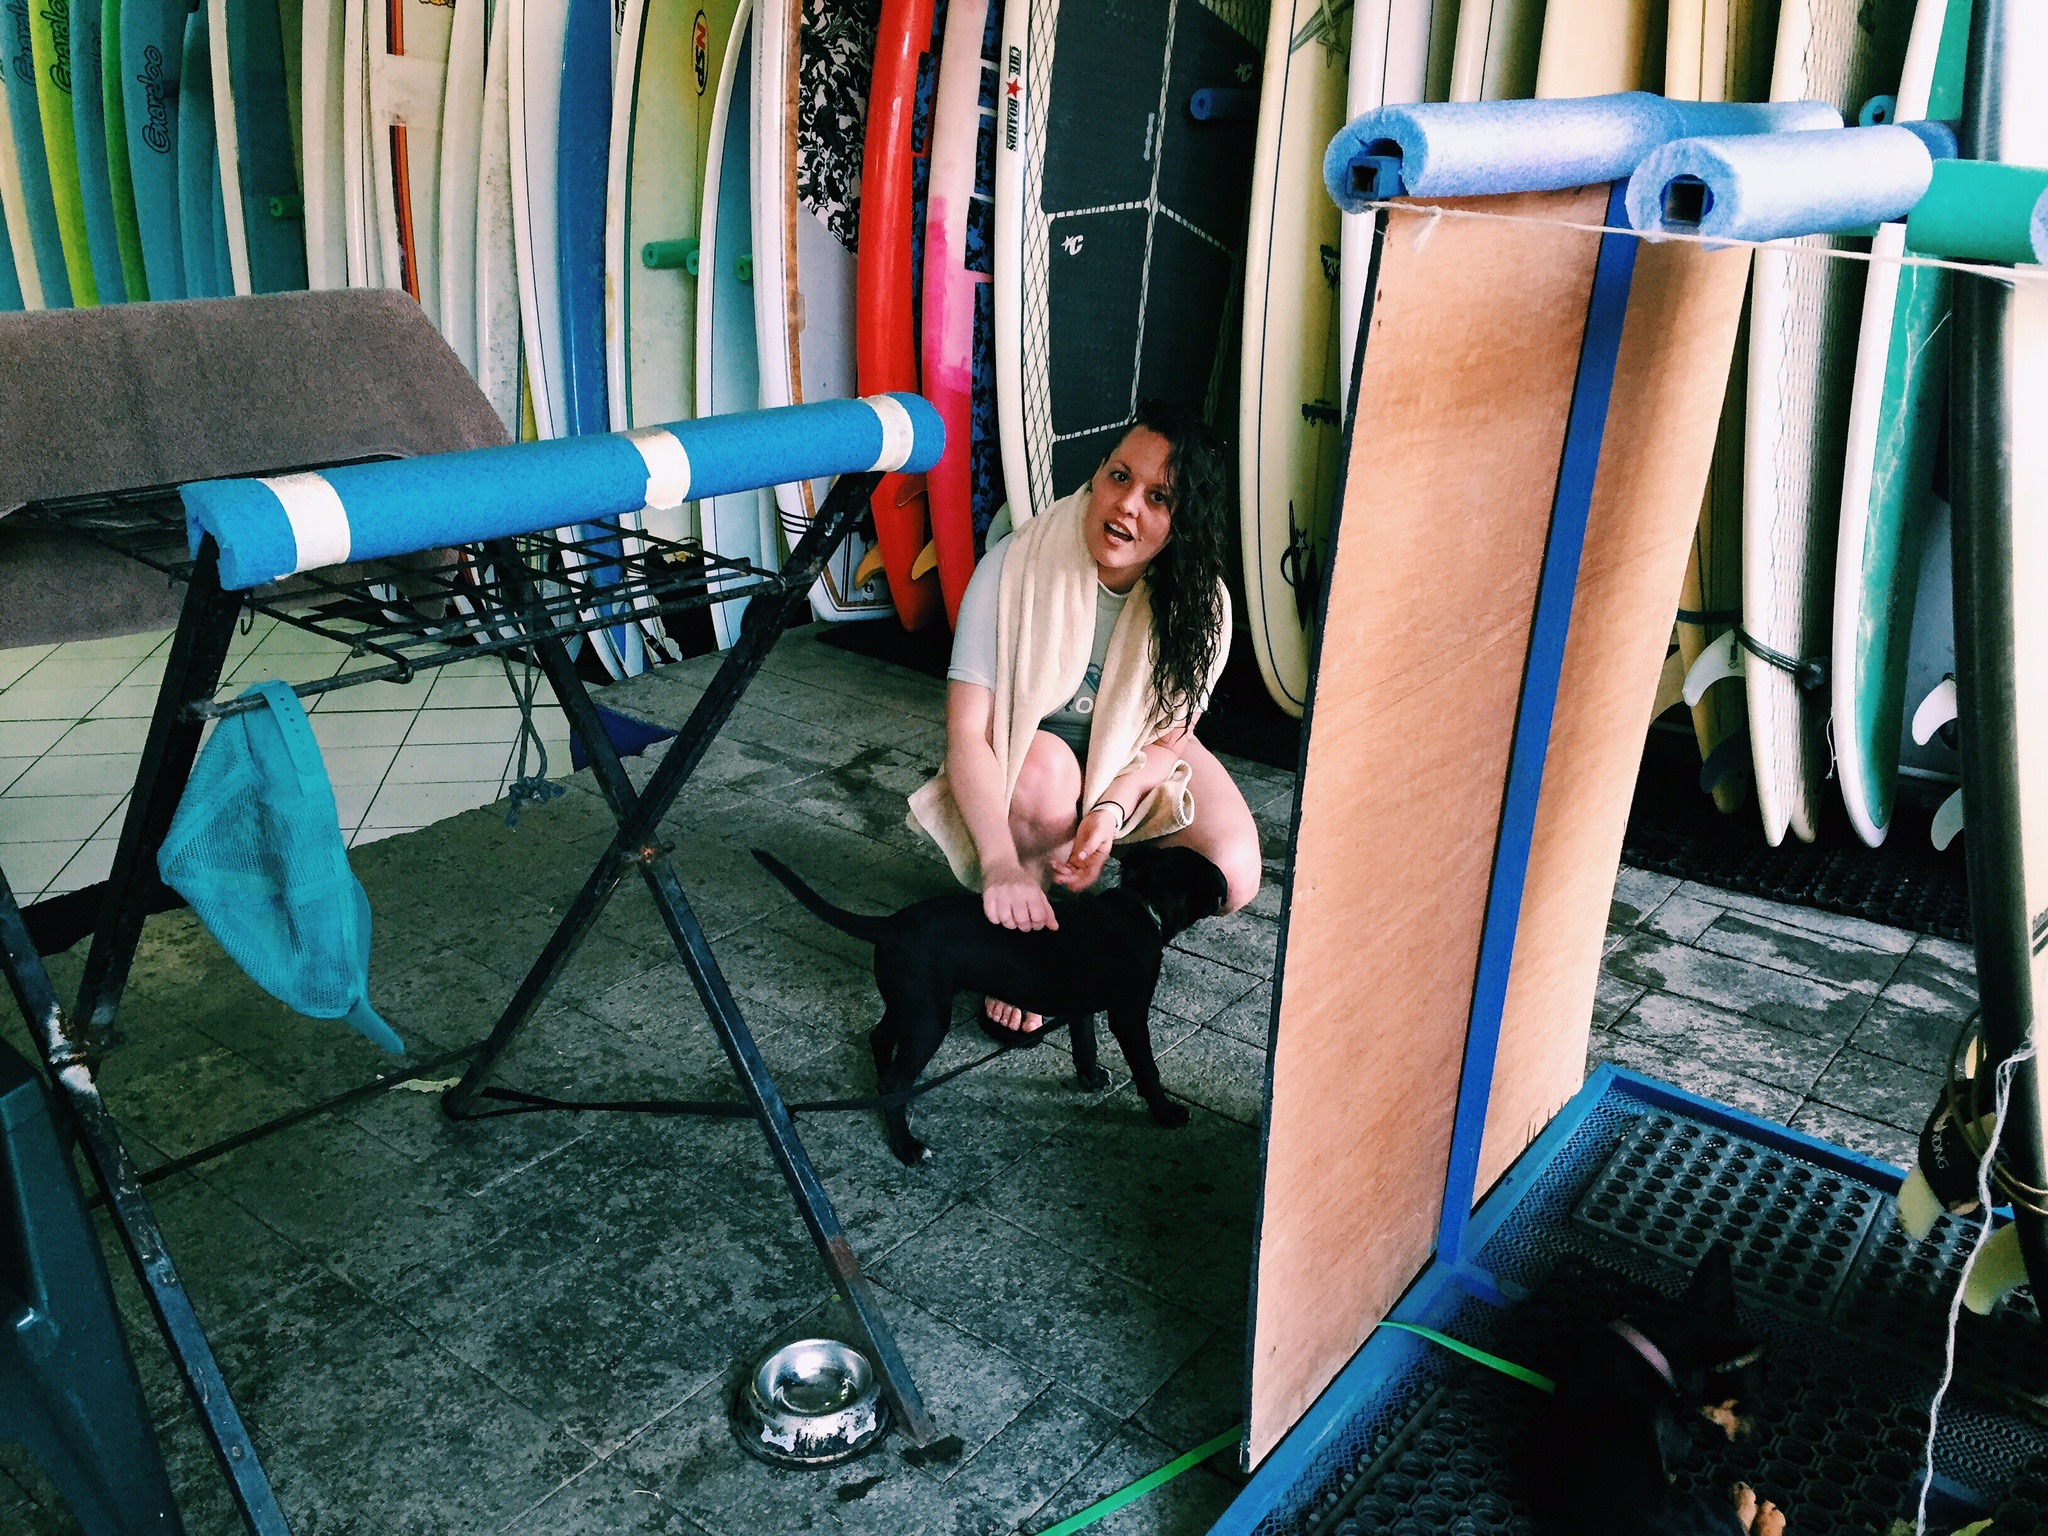 Kelly's surf shop